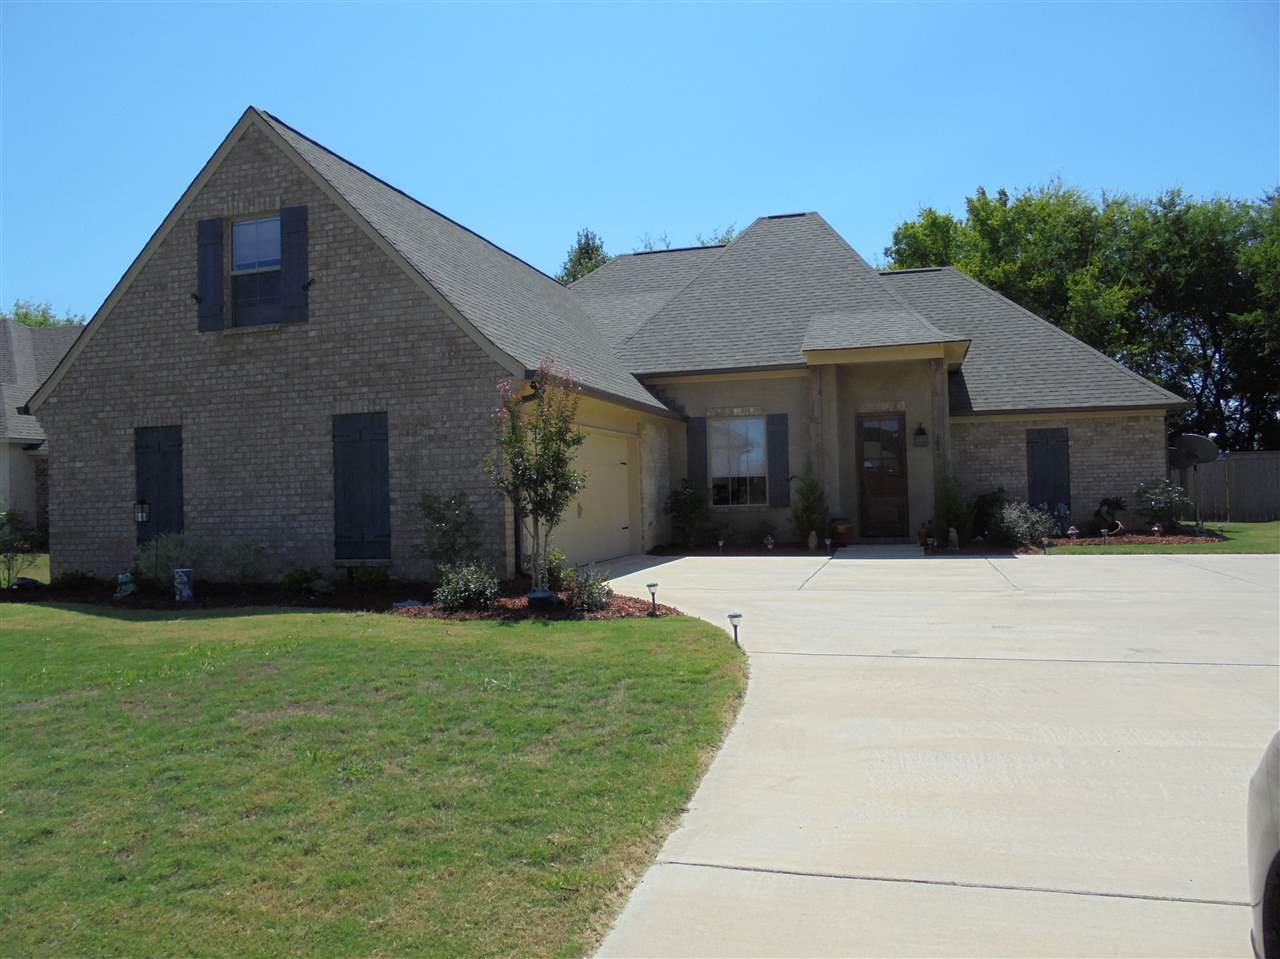 Real Estate for Sale, ListingId: 35194810, Madison,MS39110